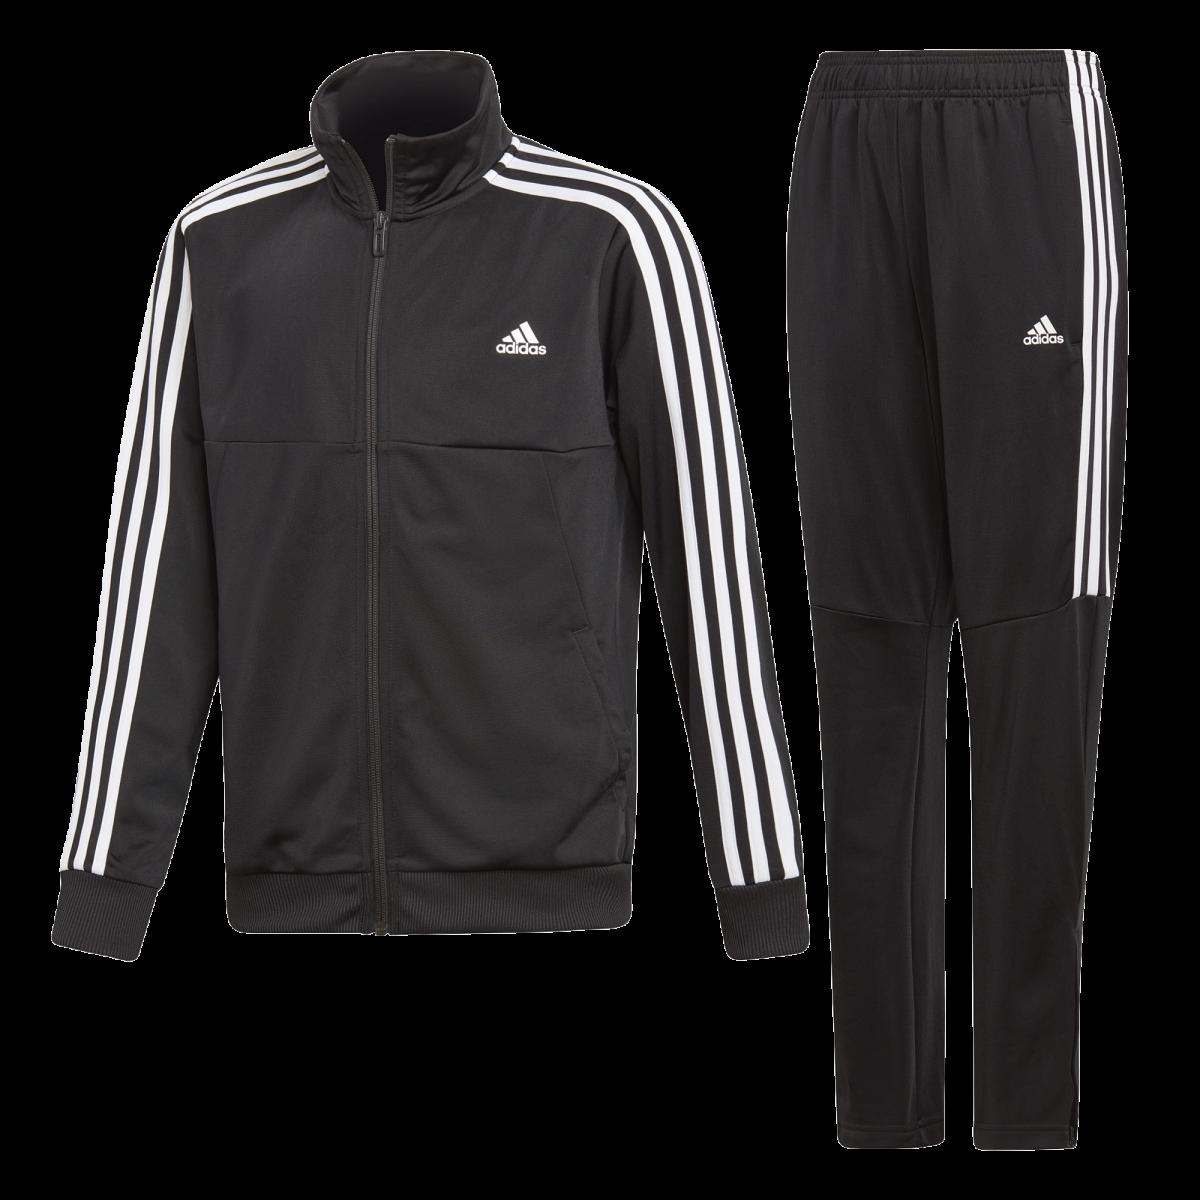 zoeken naar gratis bezorging promotiecode adidas Tiro Trainingsanzug für Kinder